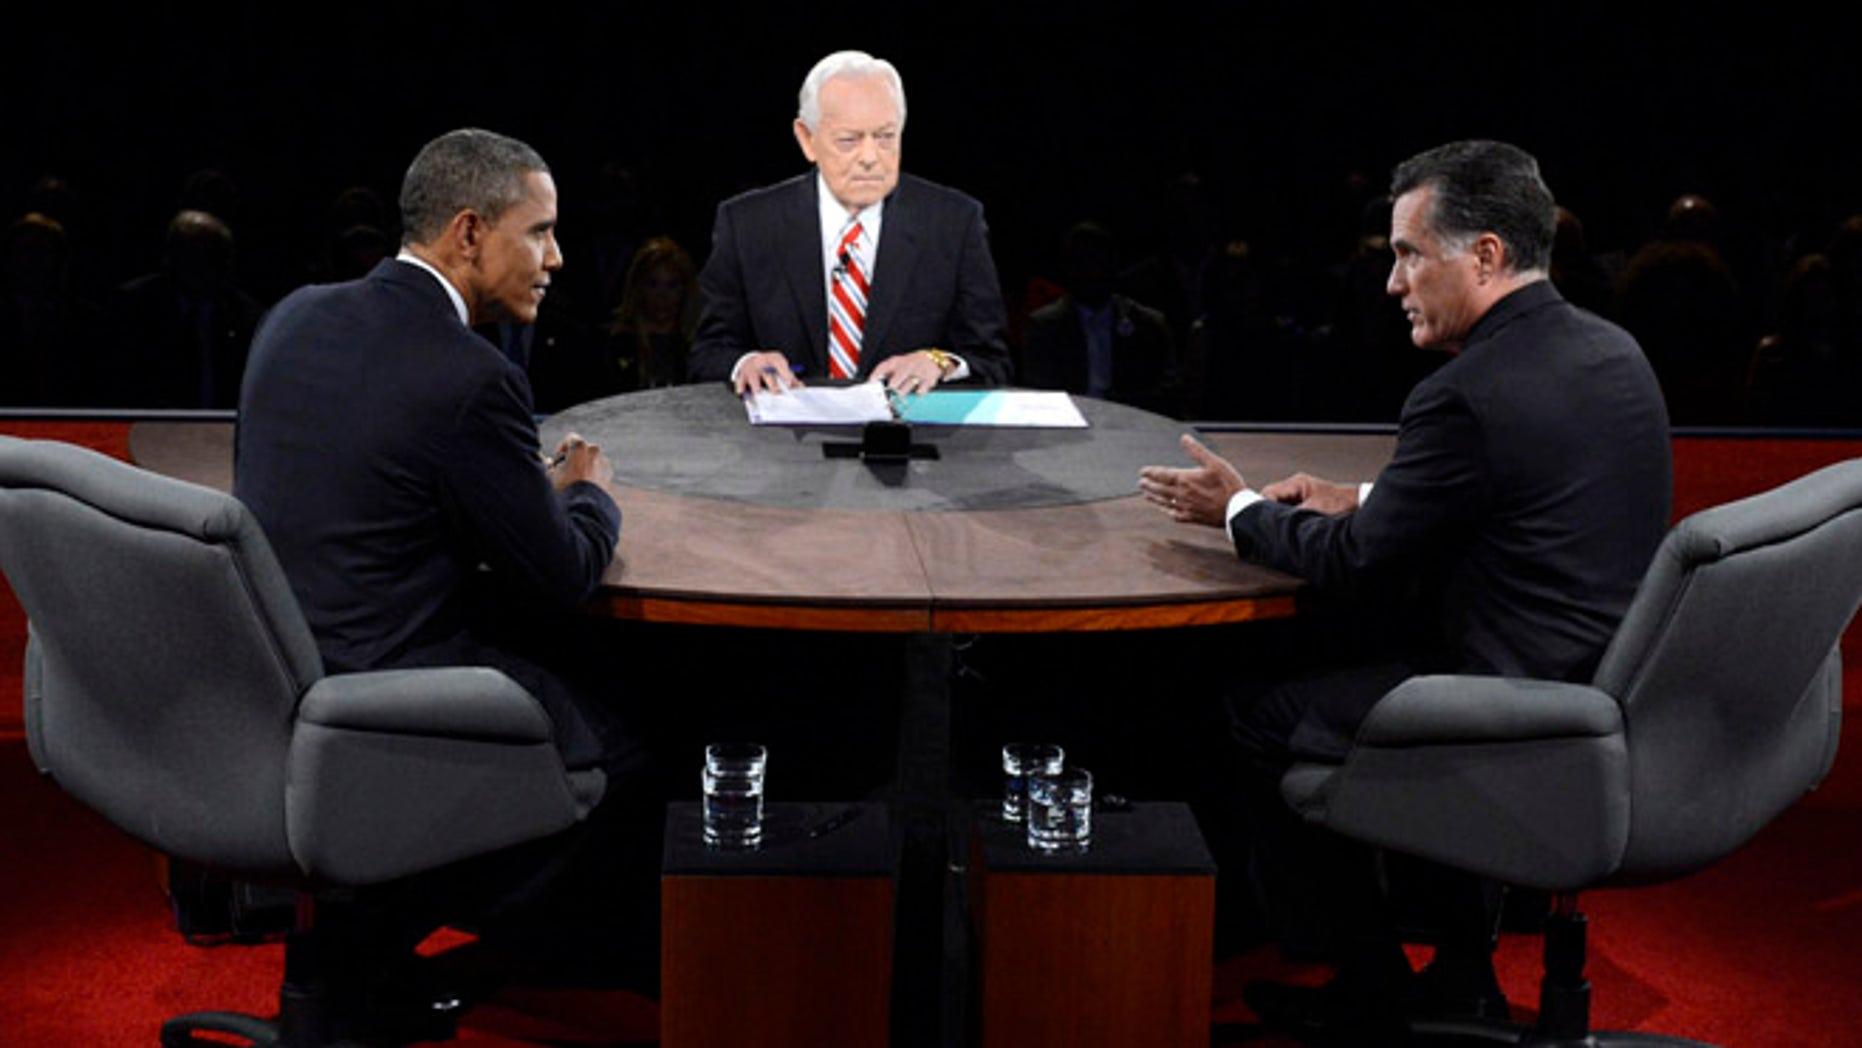 FILE: Oct. 22, 2012: President Obama and moderator Bob Schieffer listen as Republican presidential nominee Mitt Romney speaks during the third presidential debate.